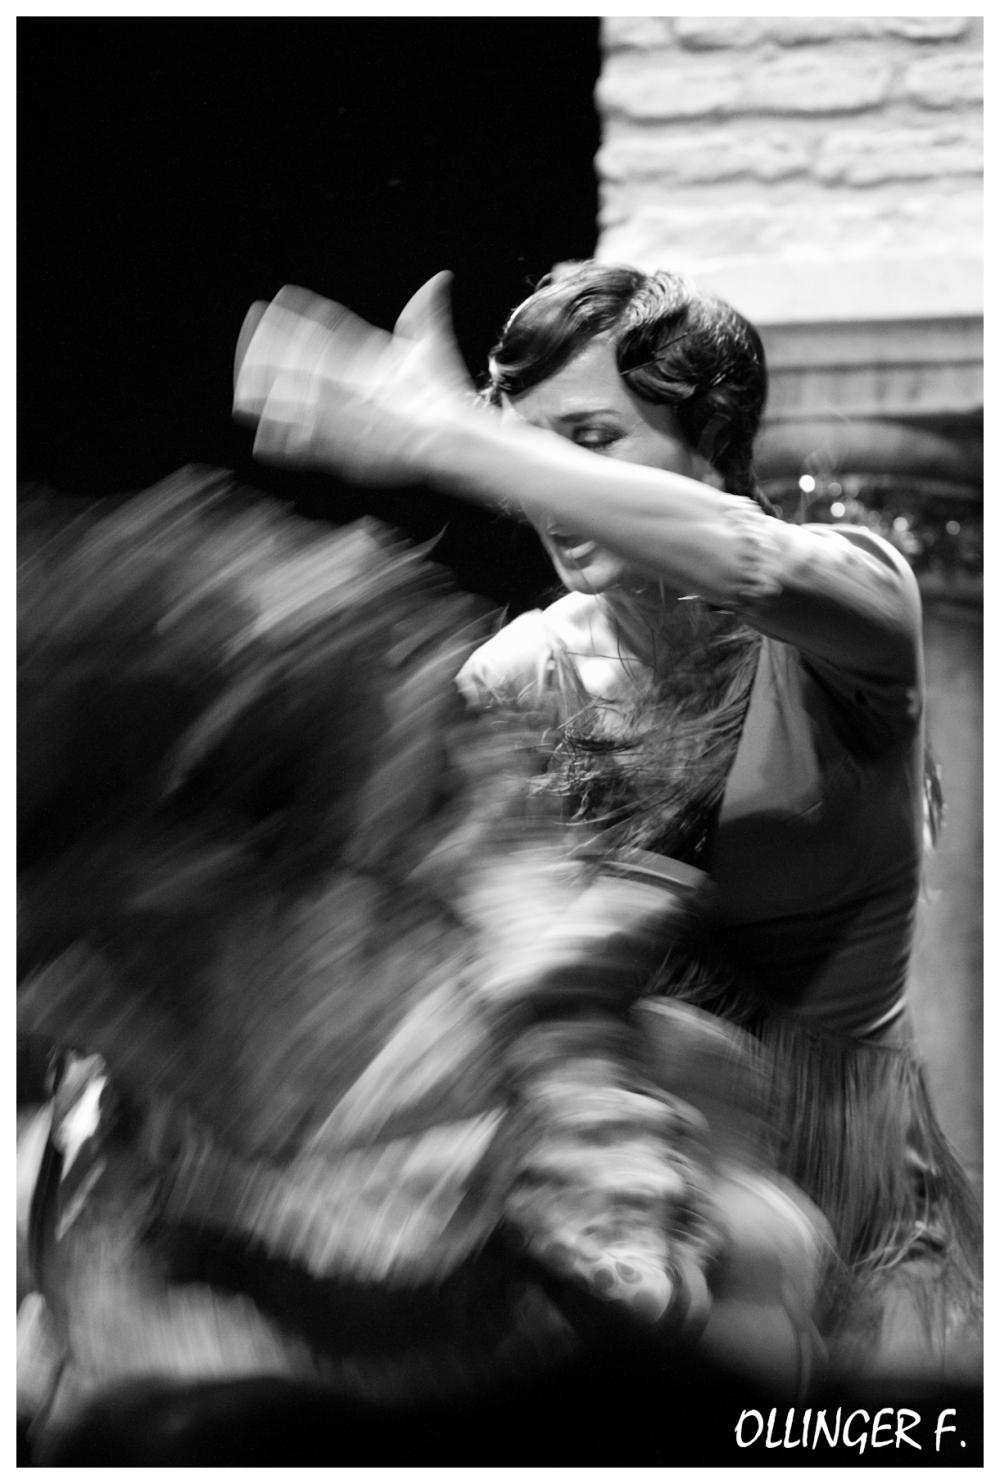 Flamenco dancing woman